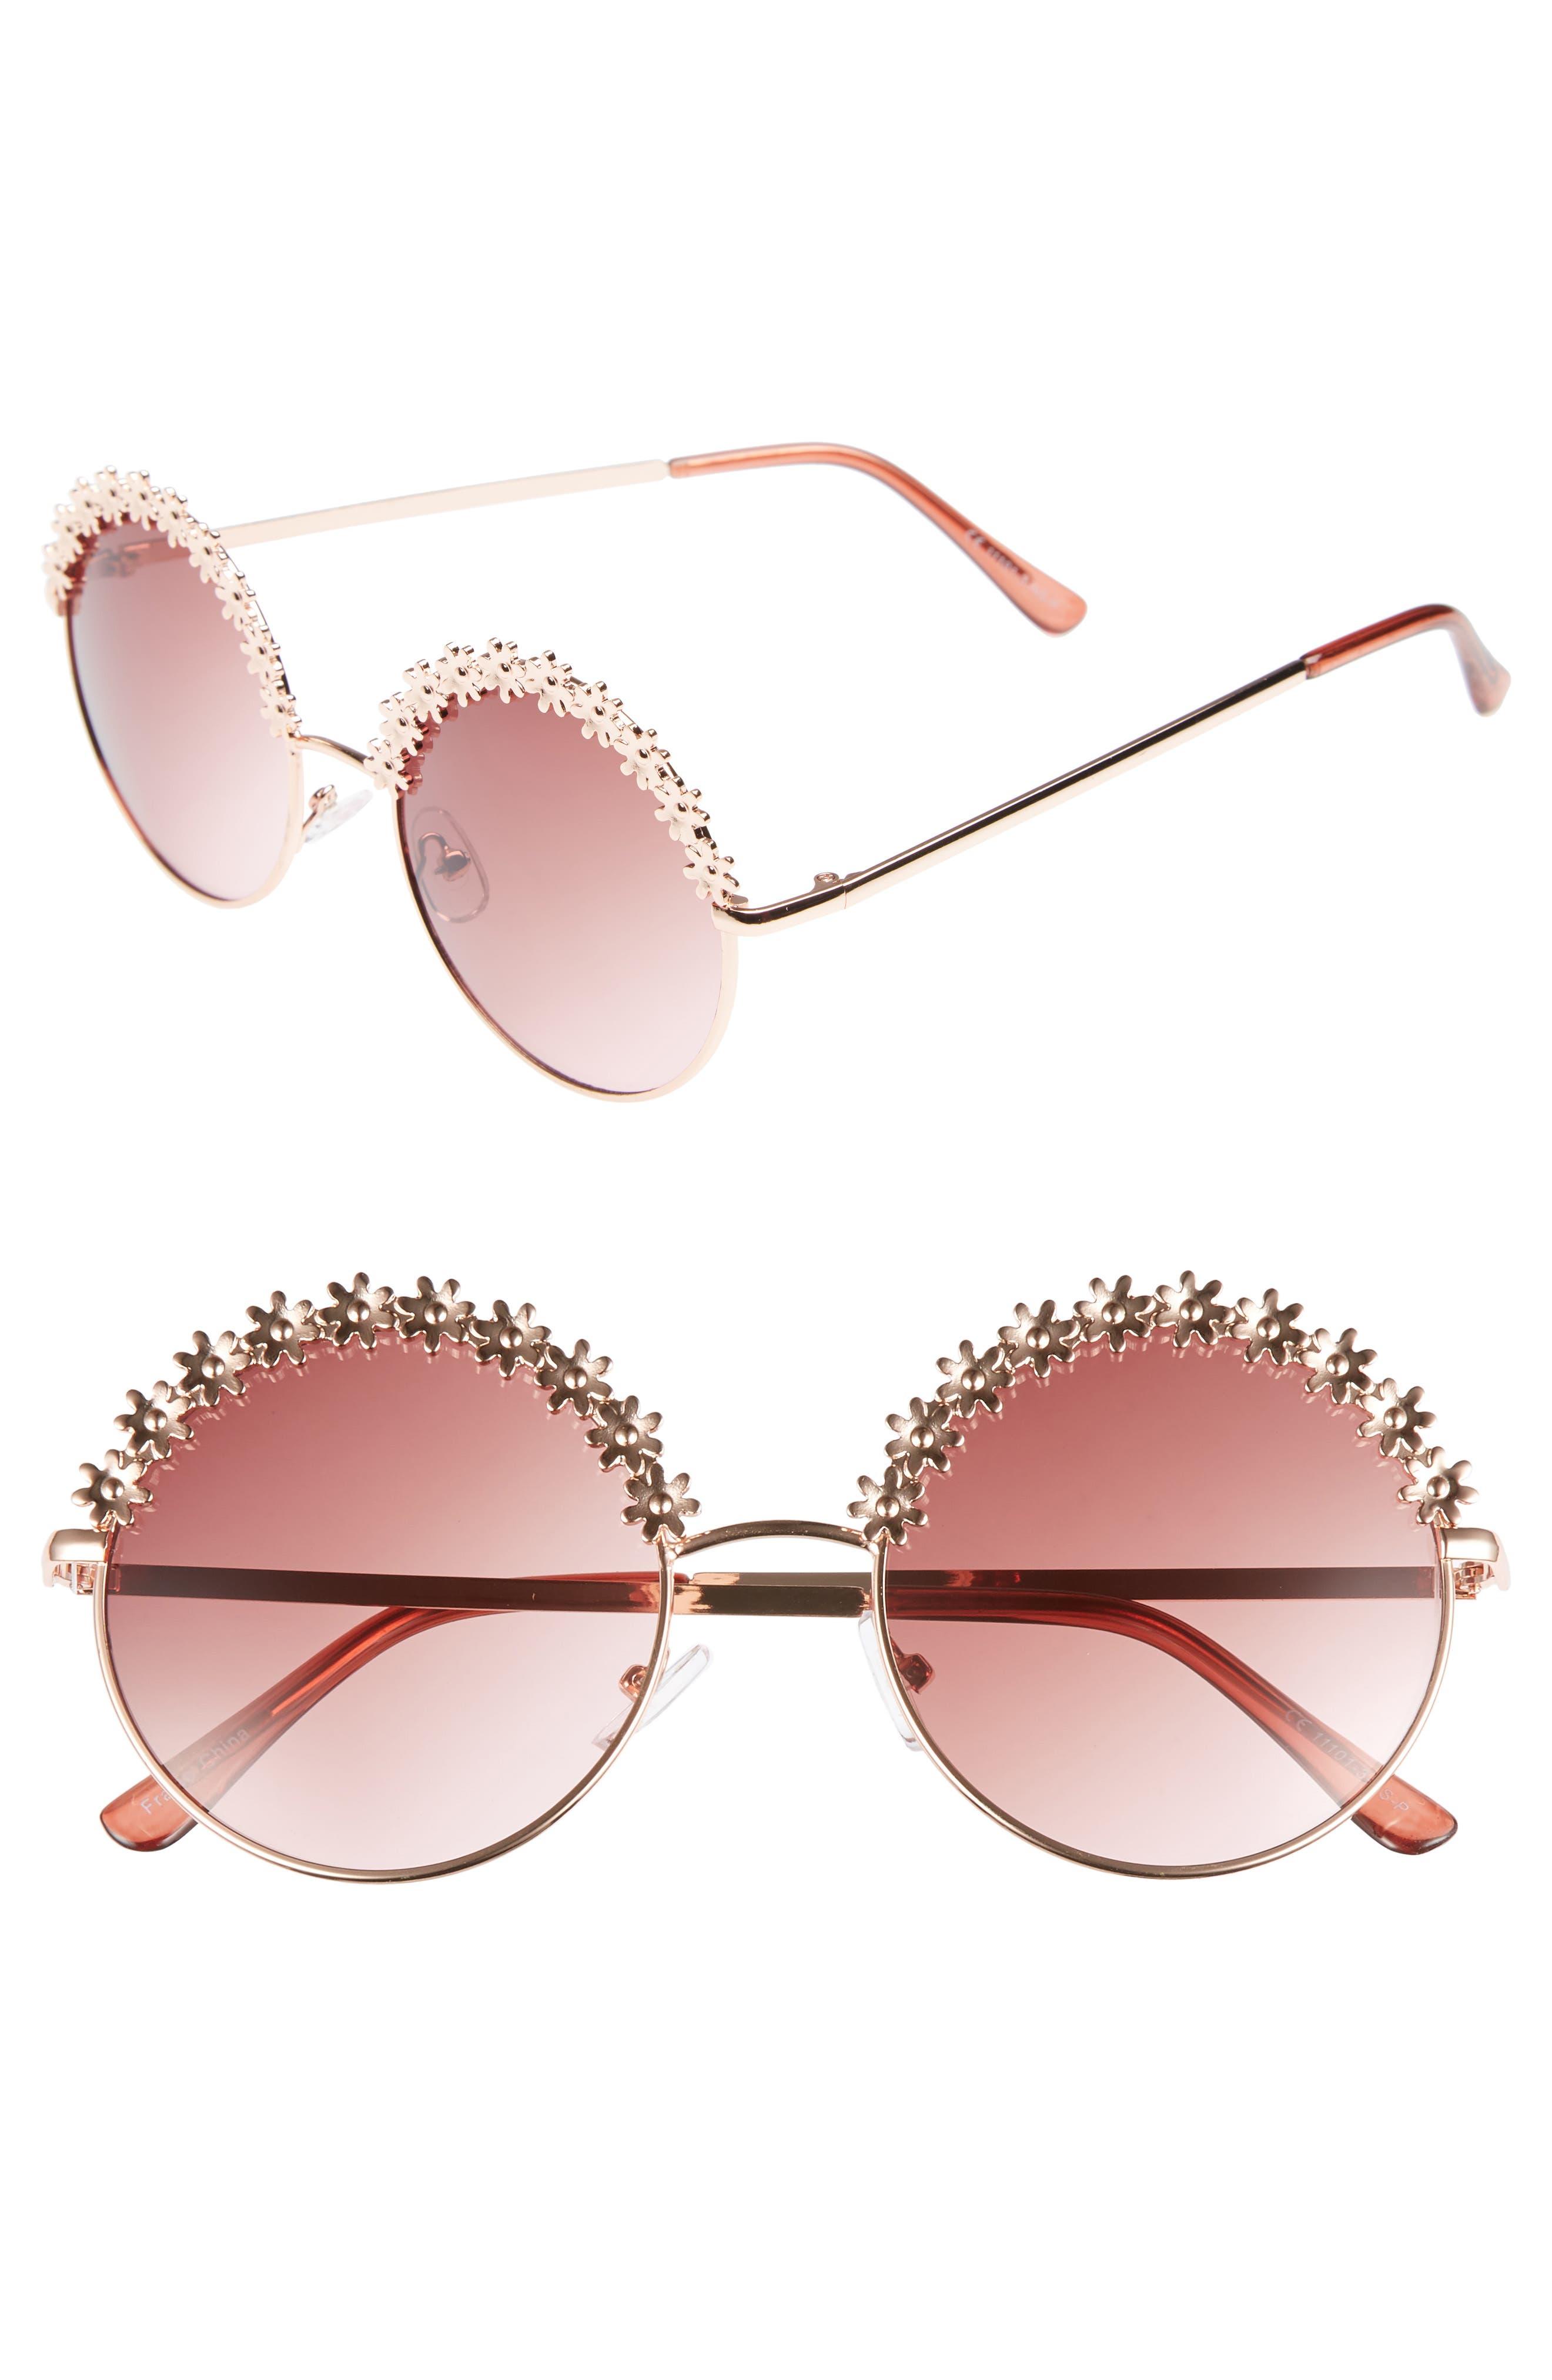 52mm Flower Trim Round Sunglasses,                         Main,                         color, Gold